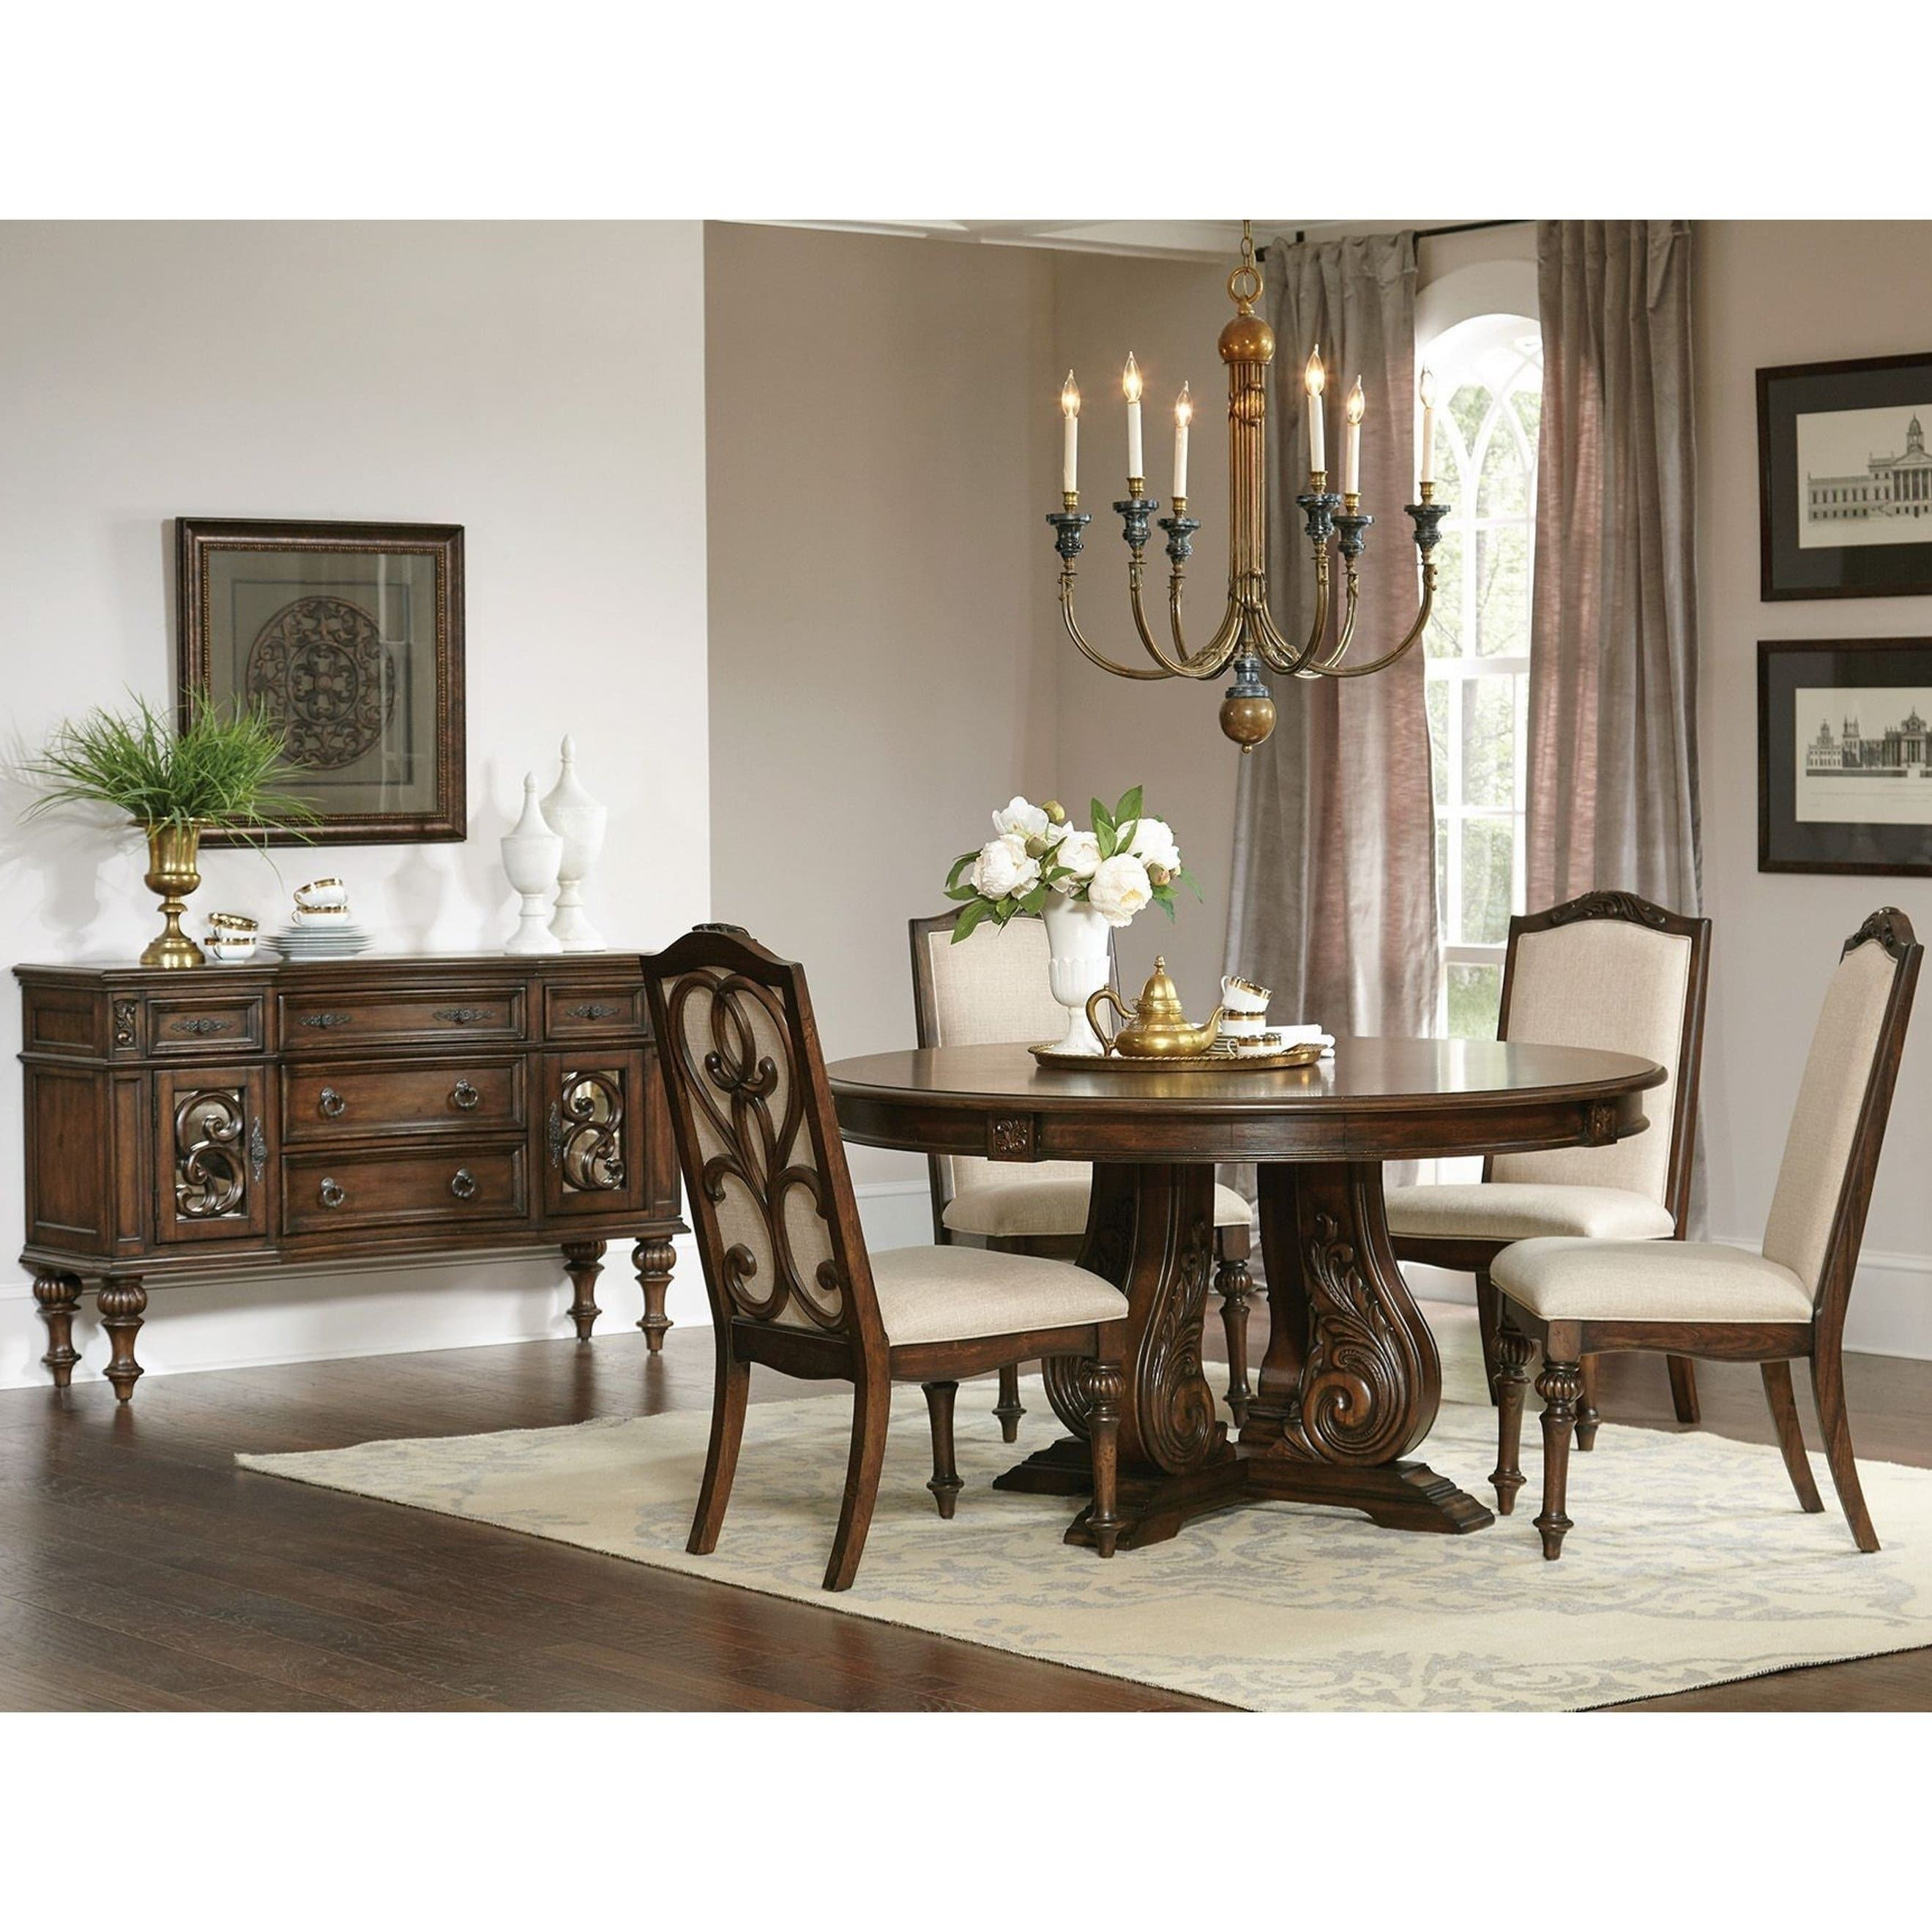 La Bauhinia French Antique Carved Wood Design Round Dining Set